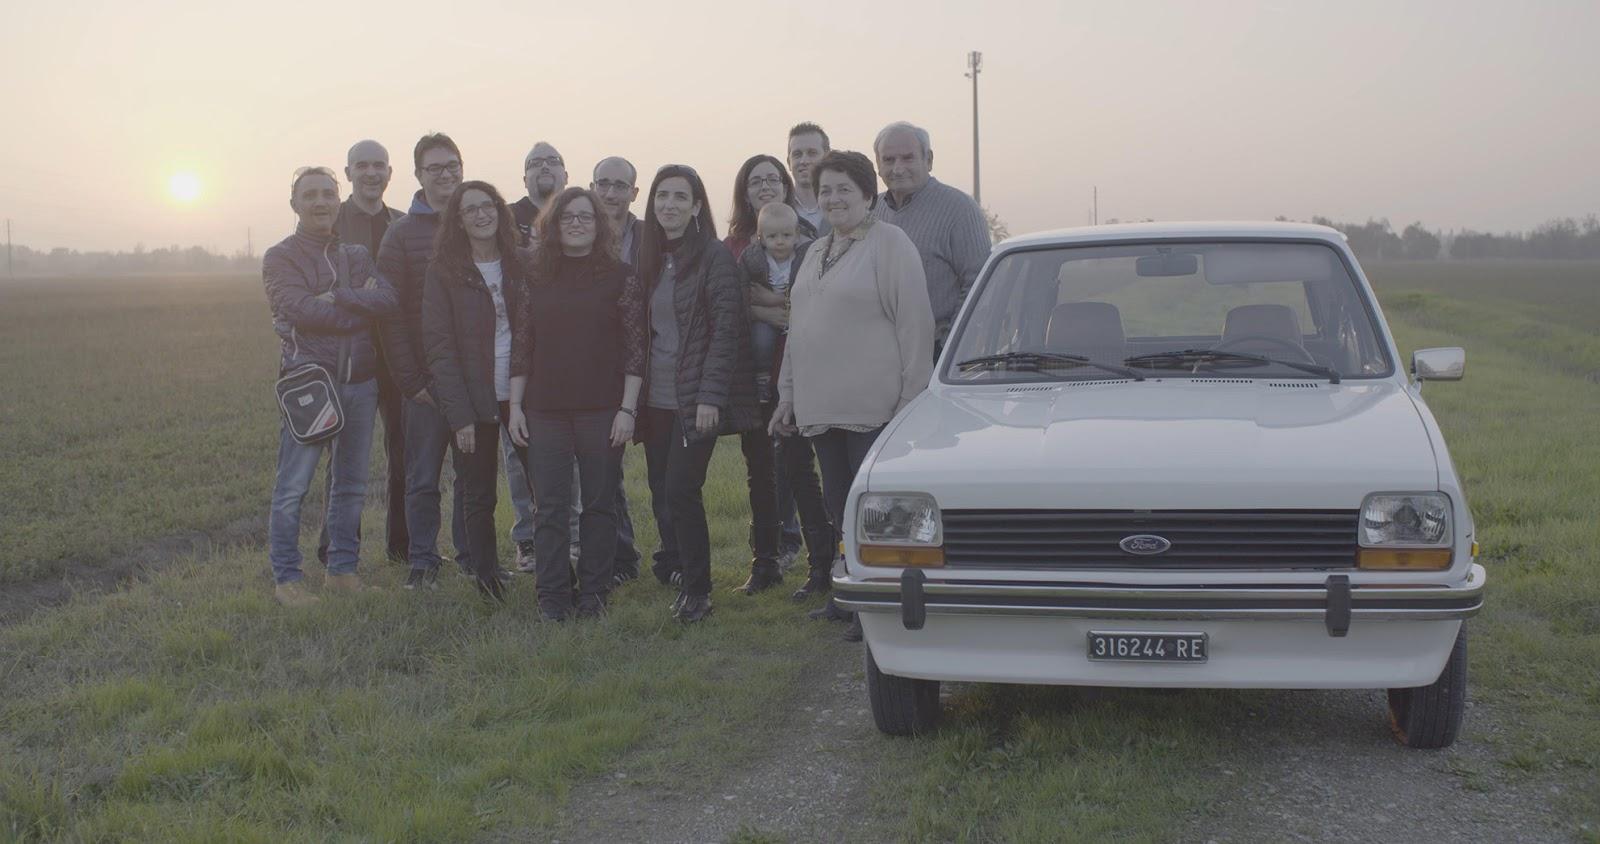 FamilyPhoto 7 παιδιά οργάνωσαν μυστικά την αναπαλαίωση του οικογενειακού αυτοκινήτου και συγκινούν Ford, Ford Fiesta, videos